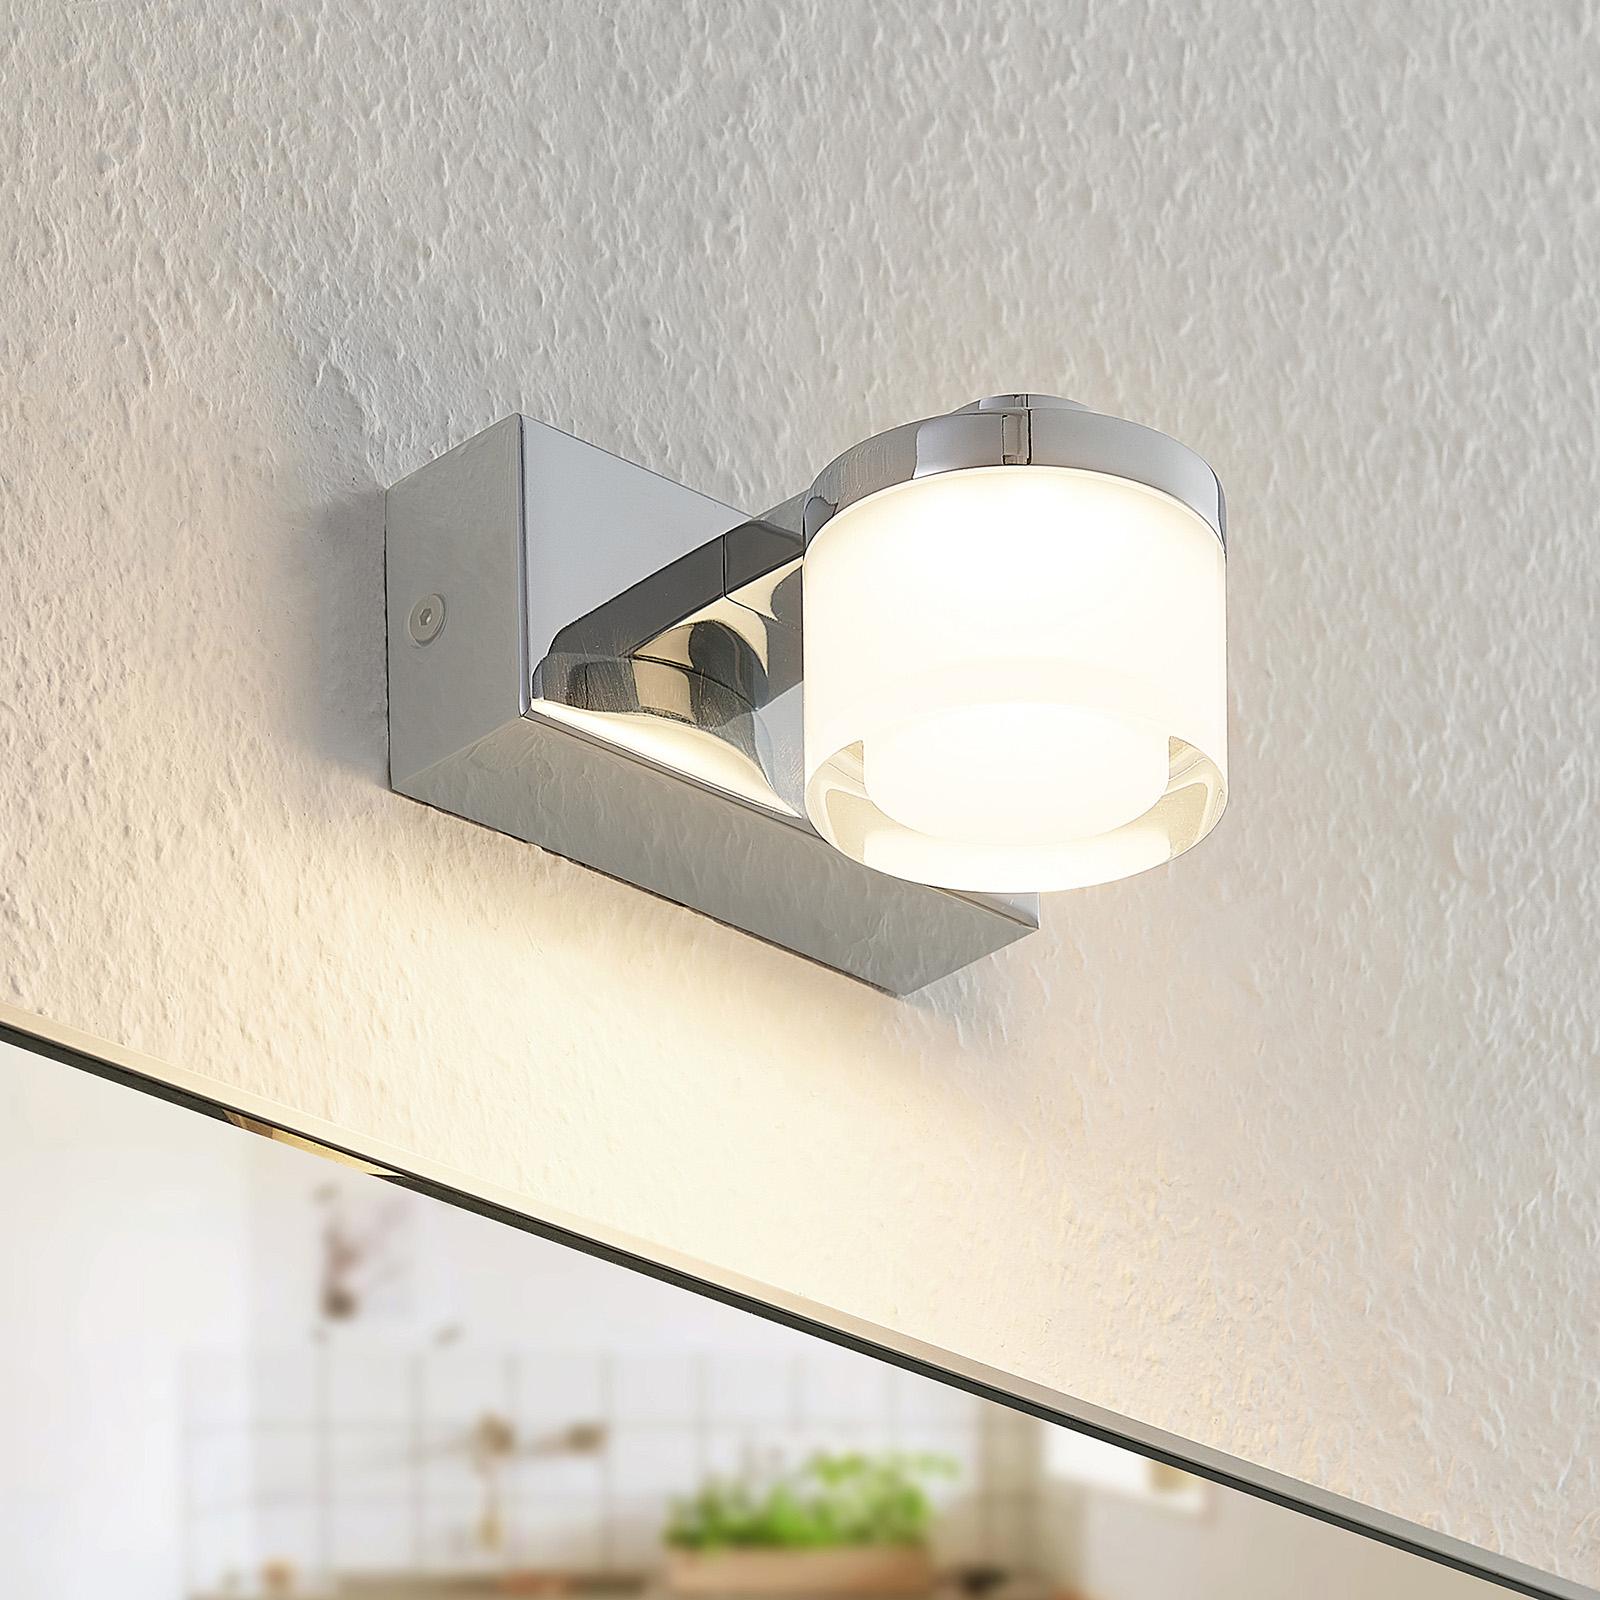 Arcchio Kejan LED-vägglampa IP44 1 lampa